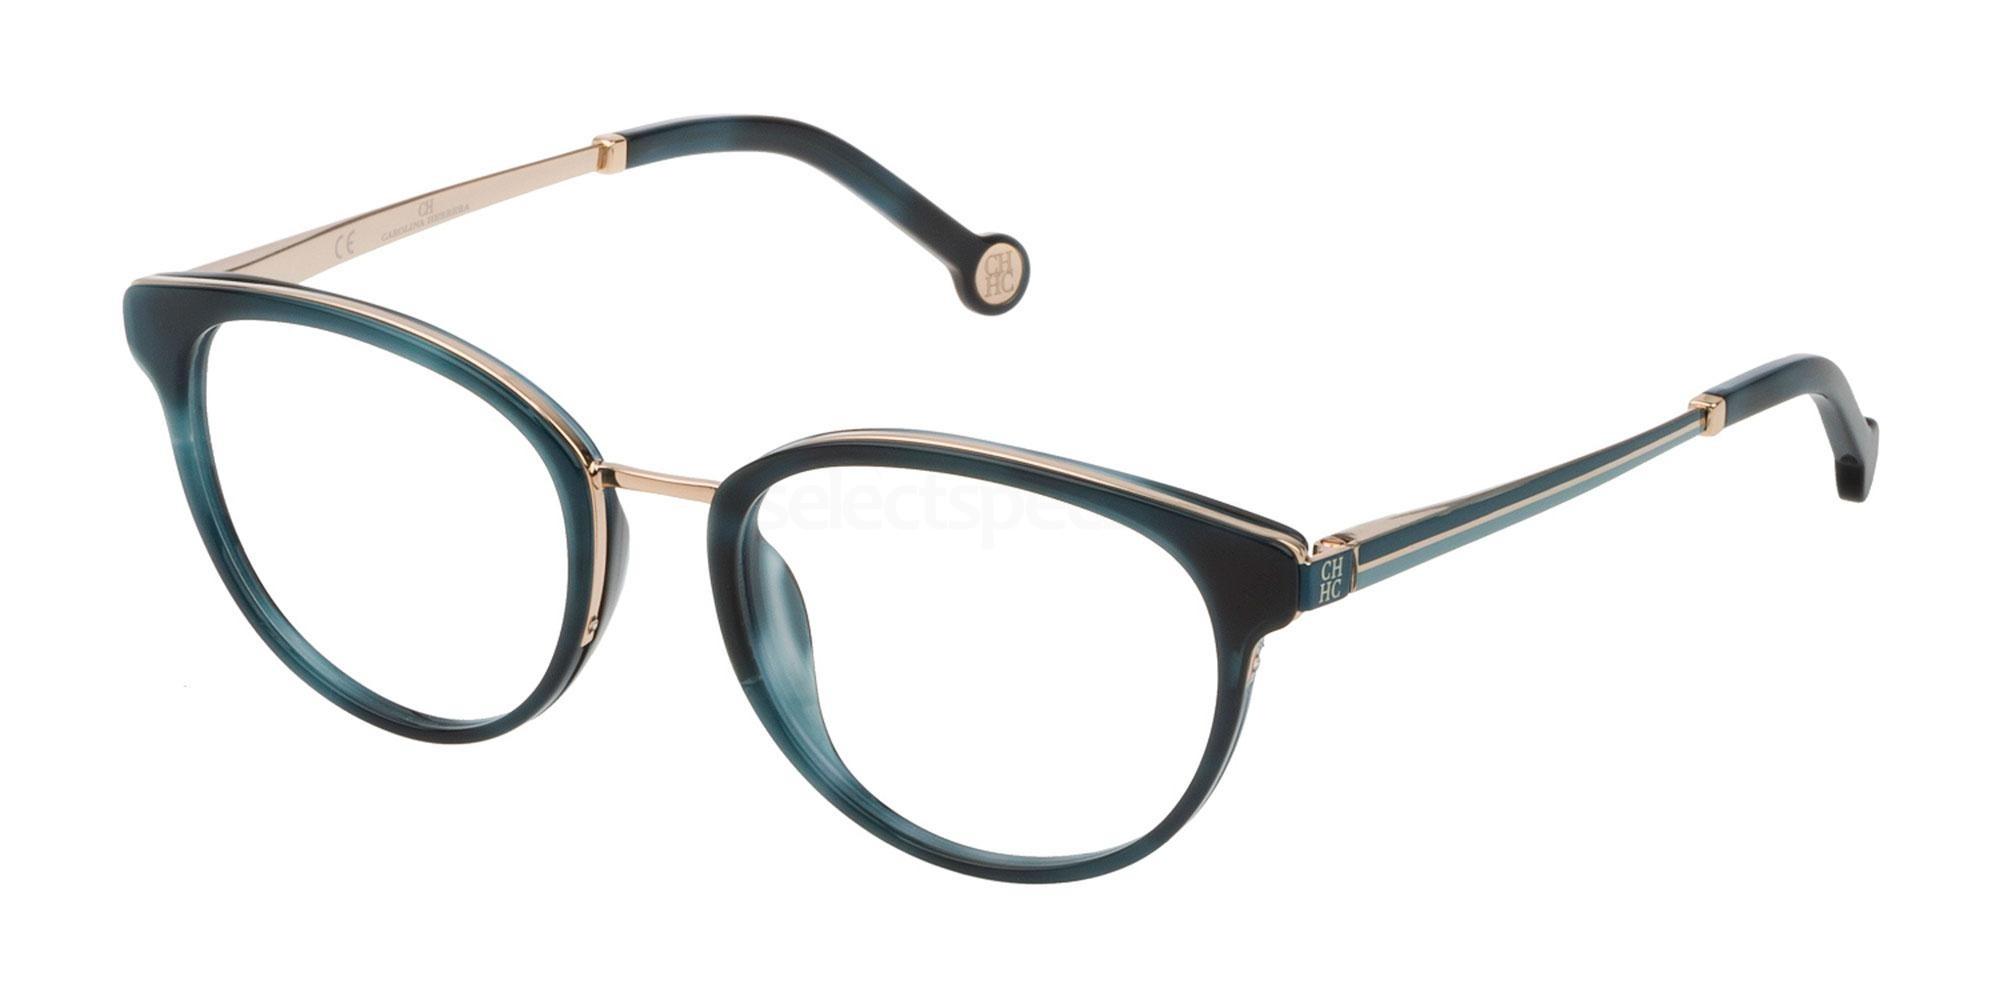 06DQ VHE124 Glasses, CH Carolina Herrera